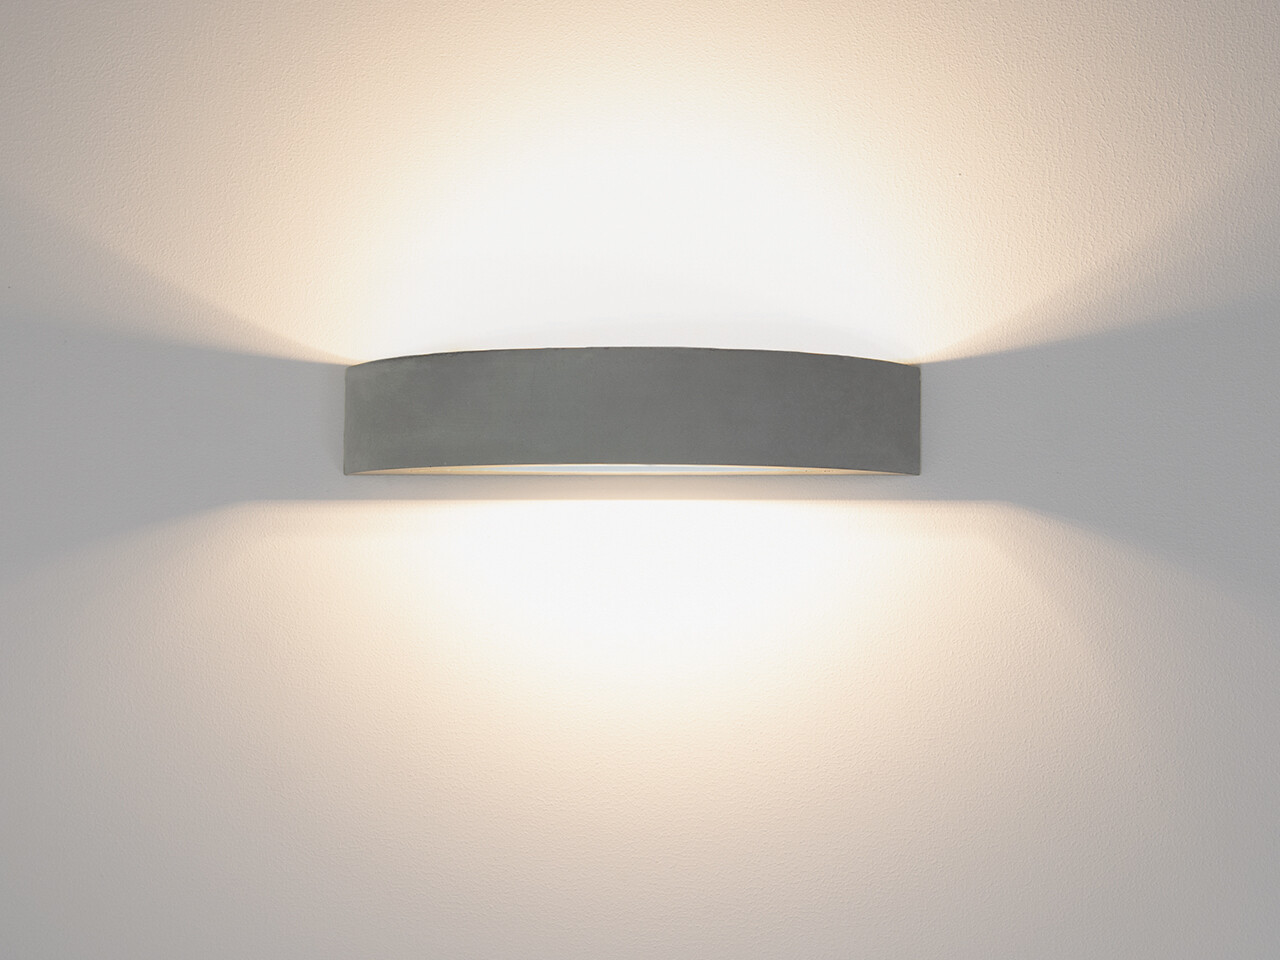 9010 Wandleuchte 1095B LED 10W, IP65, weiss